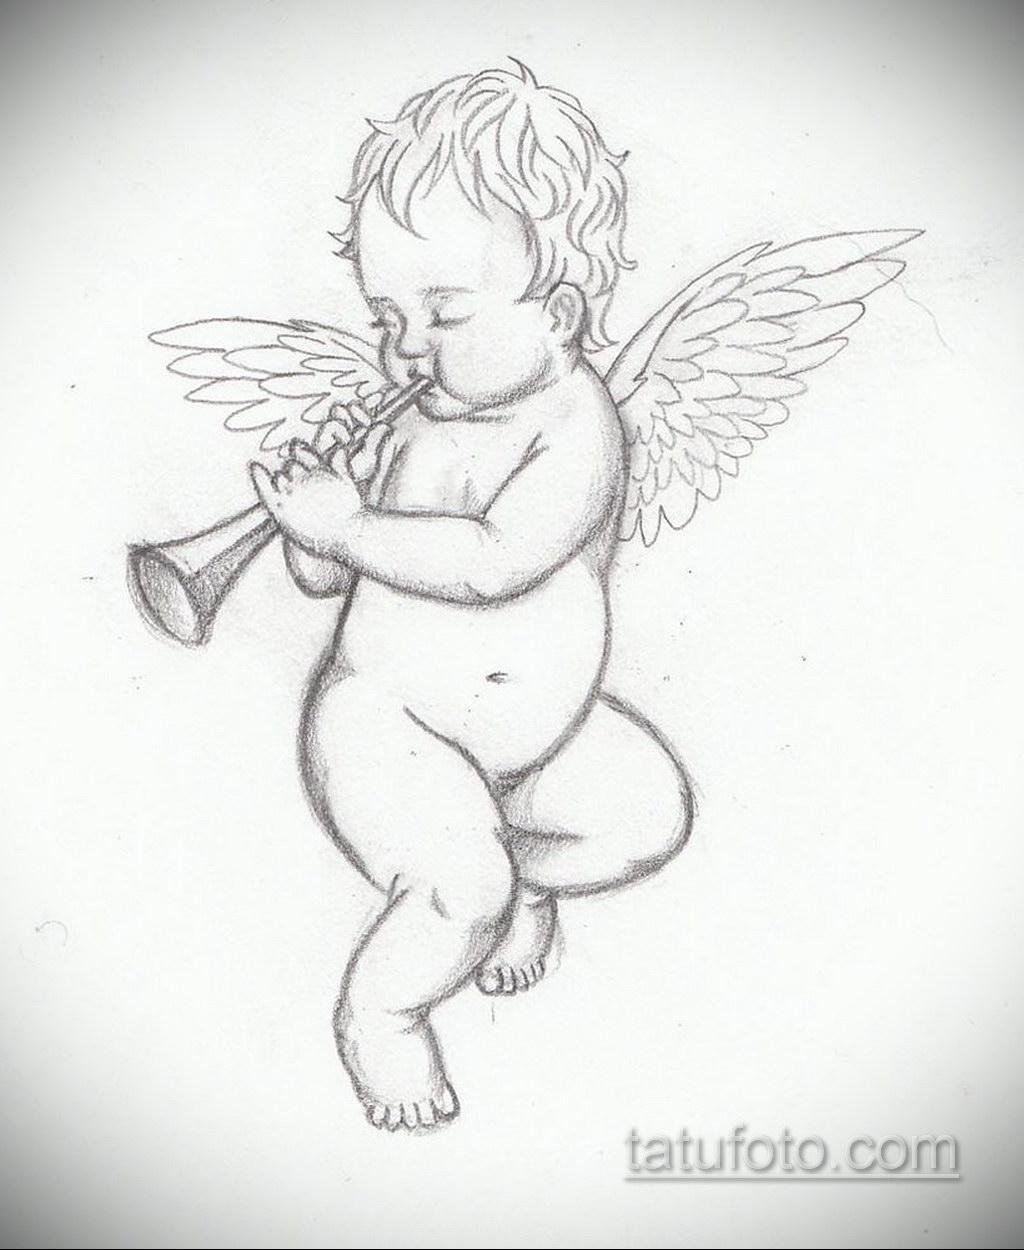 Фото ангельского рисунка тату 22.11.2020 №030 -Angelic tattoo- tatufoto.com